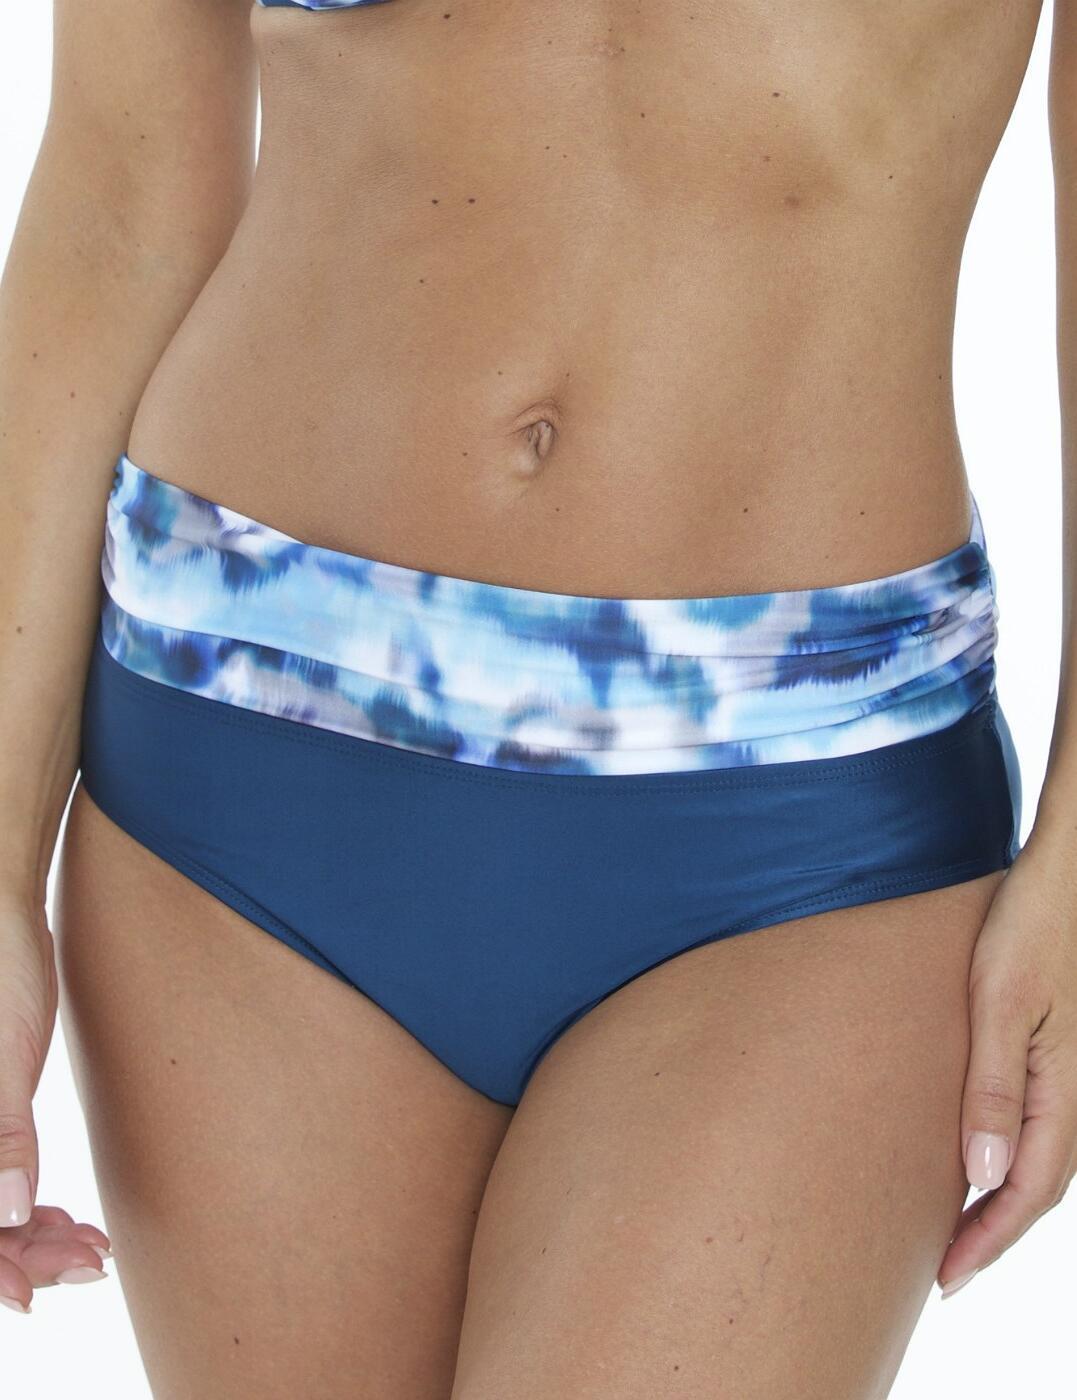 05-1350 SeaSpray Casablanca Fold Waist Bikini Brief - 05-1350 Blue Grey